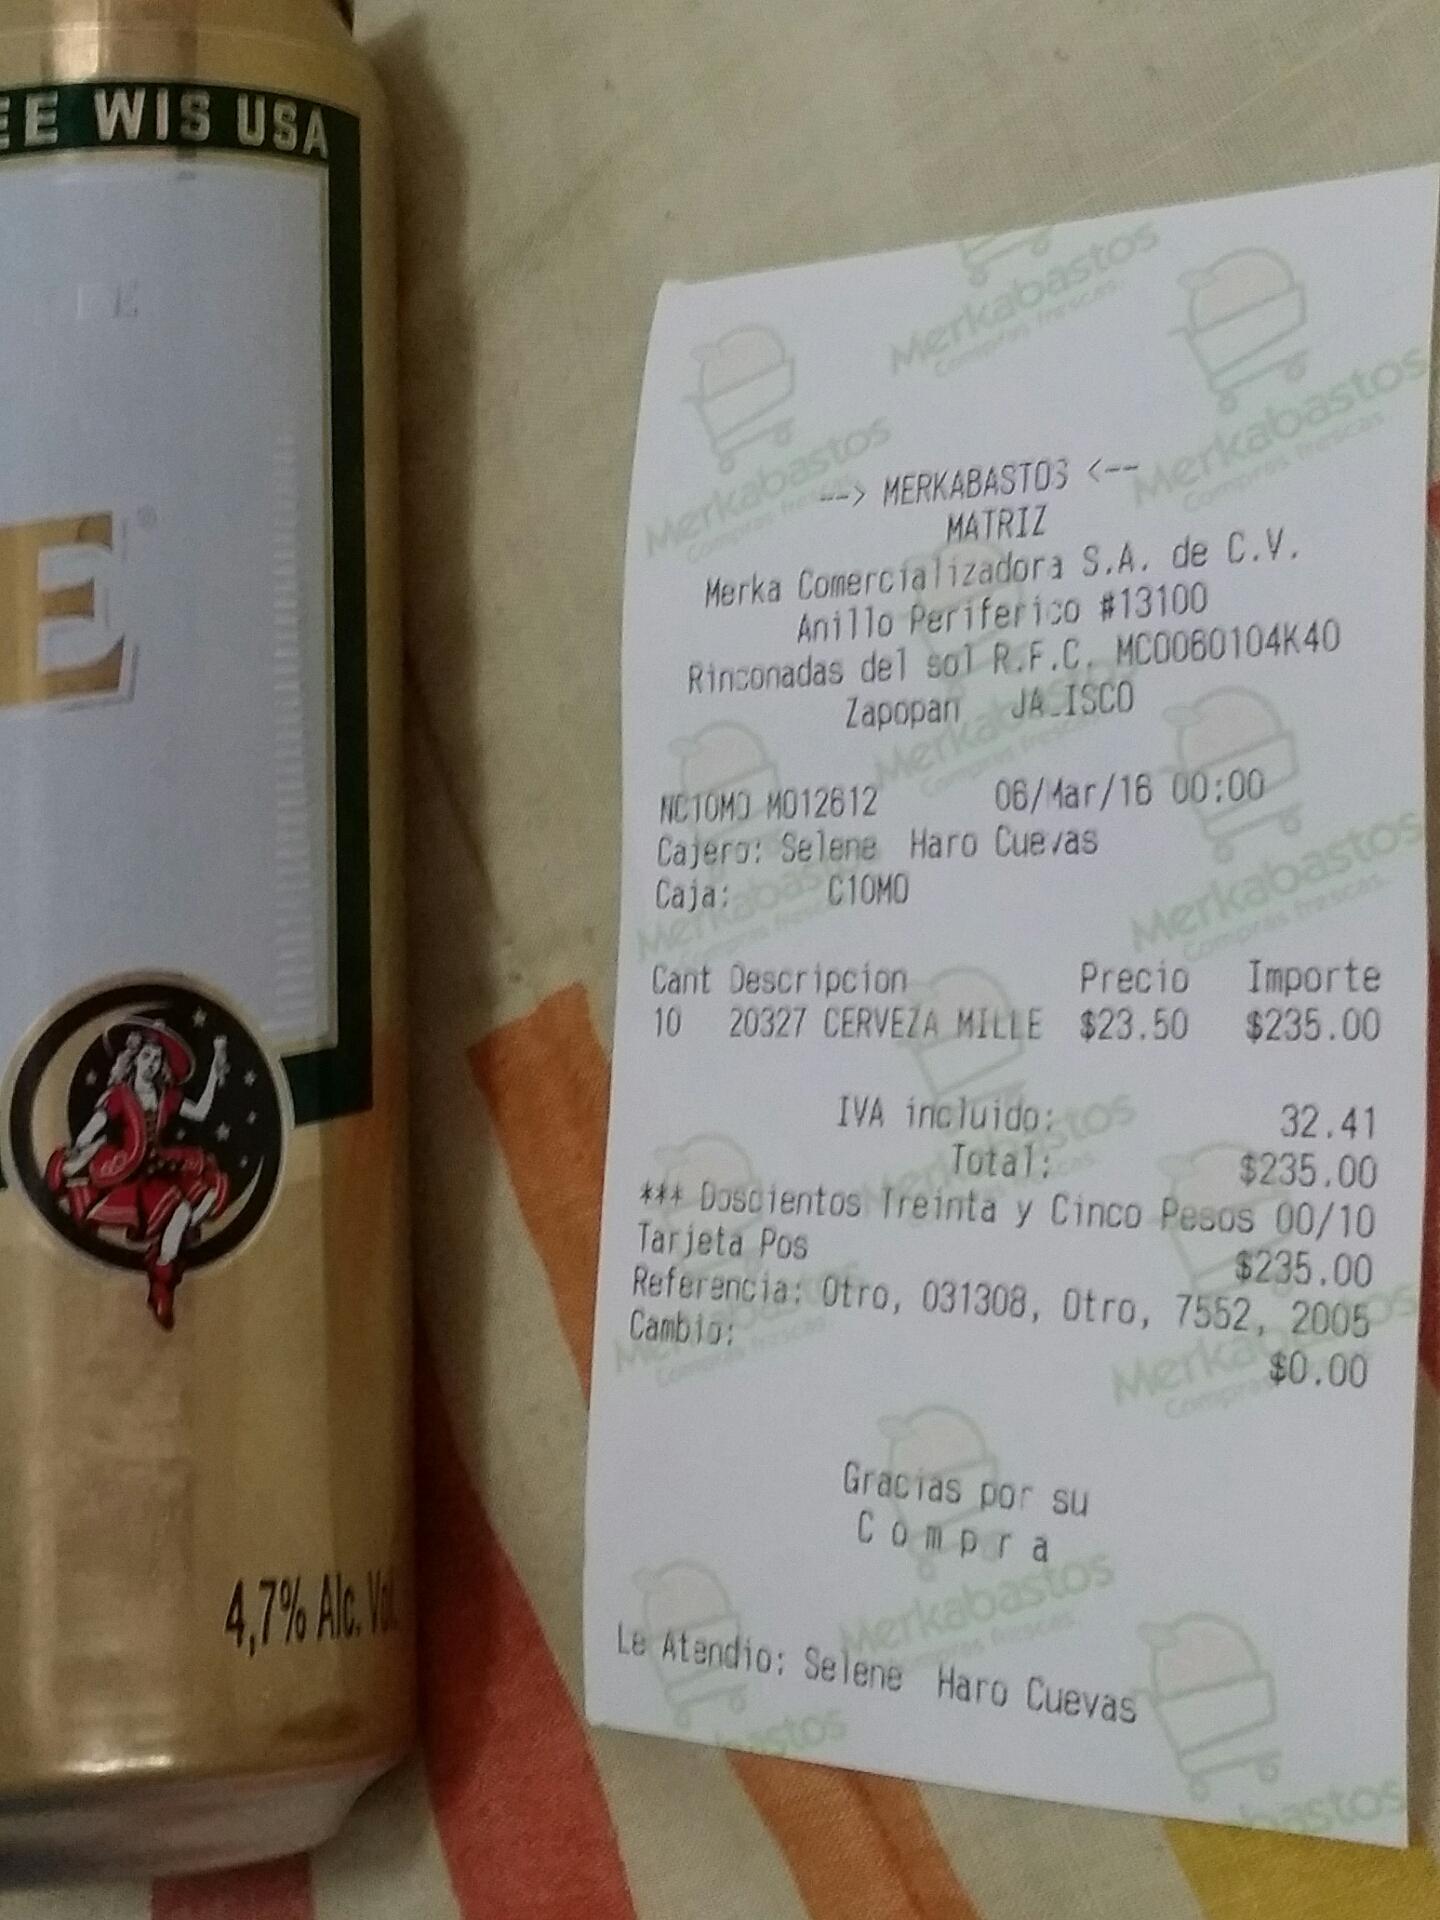 Merkabastos: Caguamas Miller a $23.50